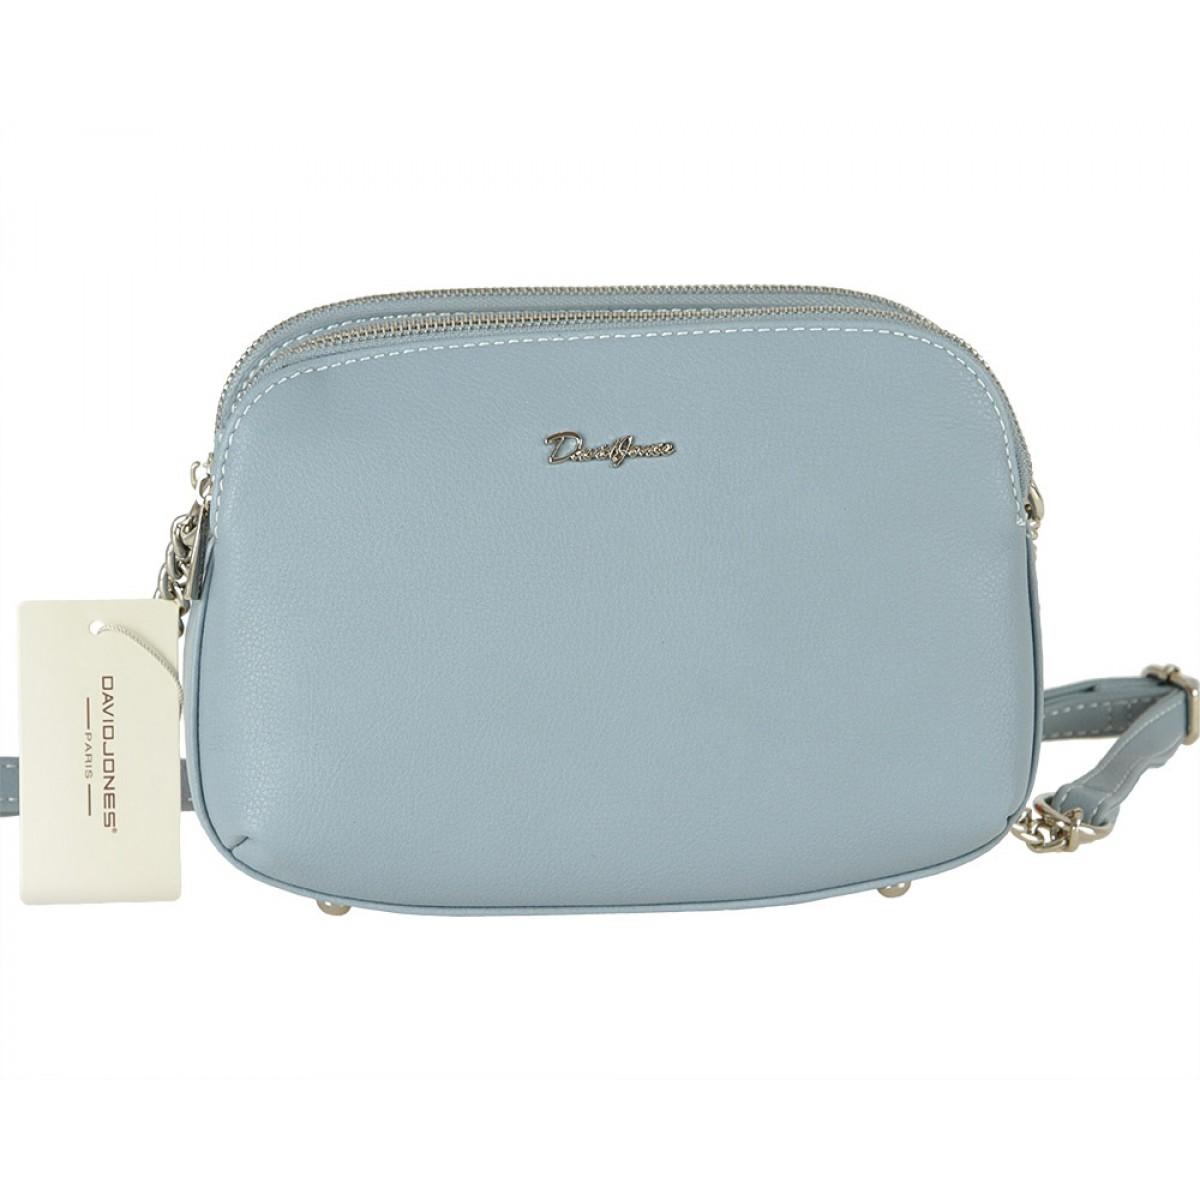 Жіноча сумка David Jones 6200-2A L.BLUE